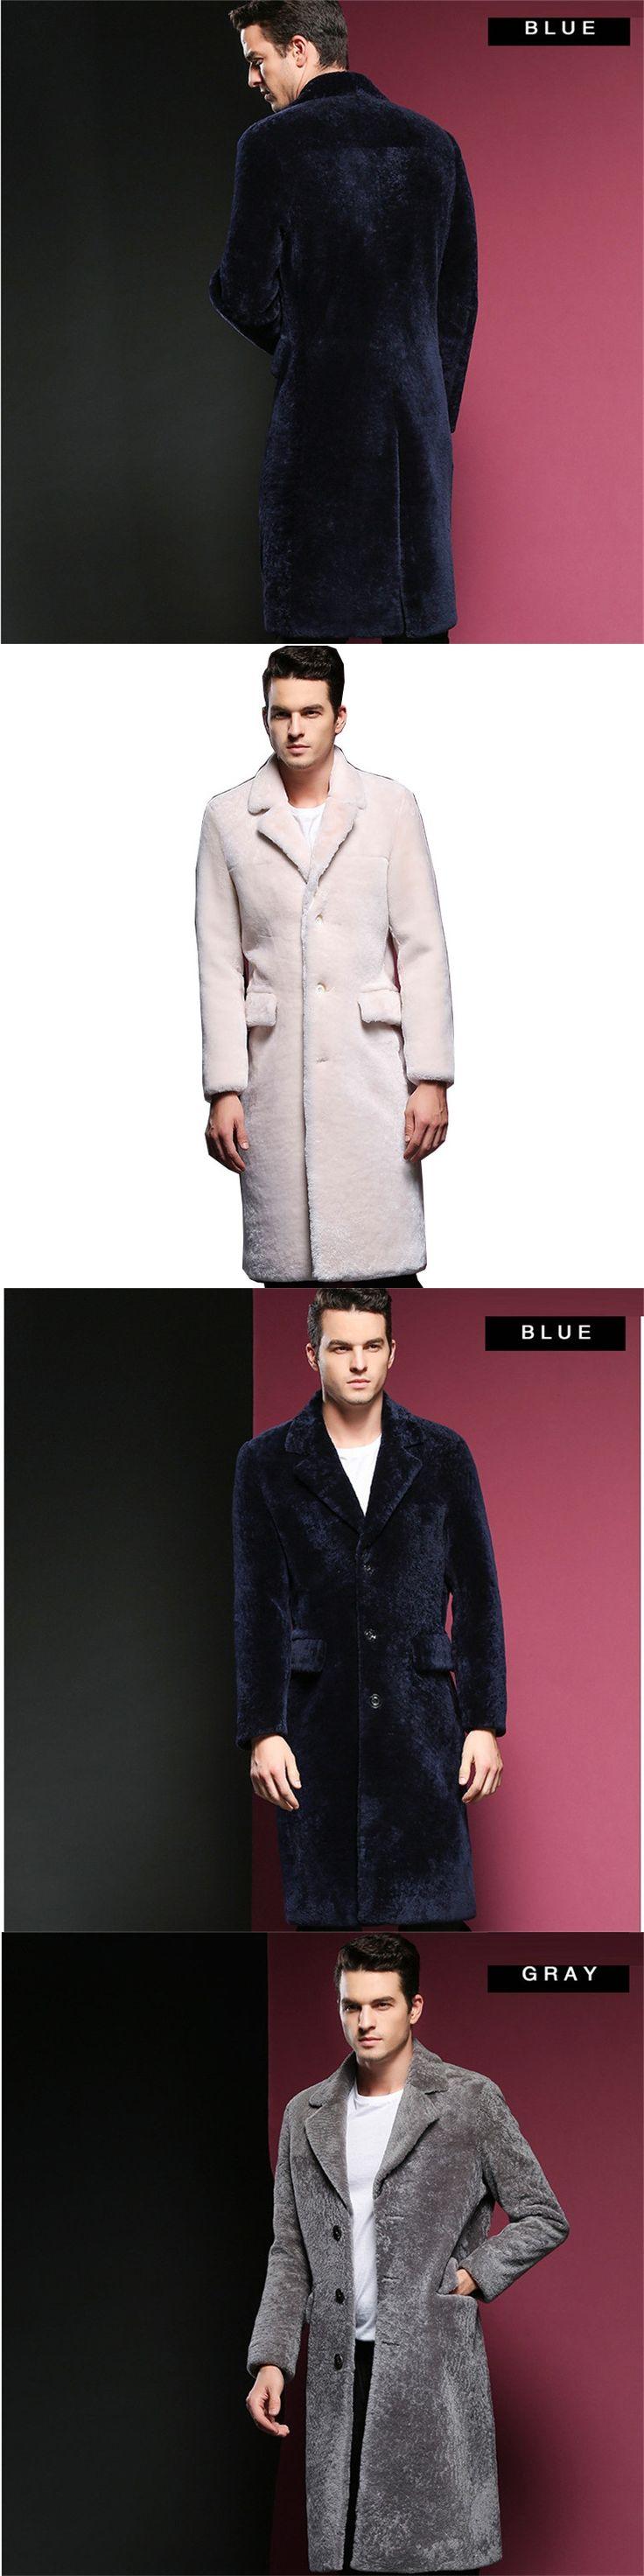 Men Fur Coat Winter 2017 Plus Size M-3XL Faux Fur Coat Men Parka Jackets Full Length Leather Overcoats With Collar Fur coats